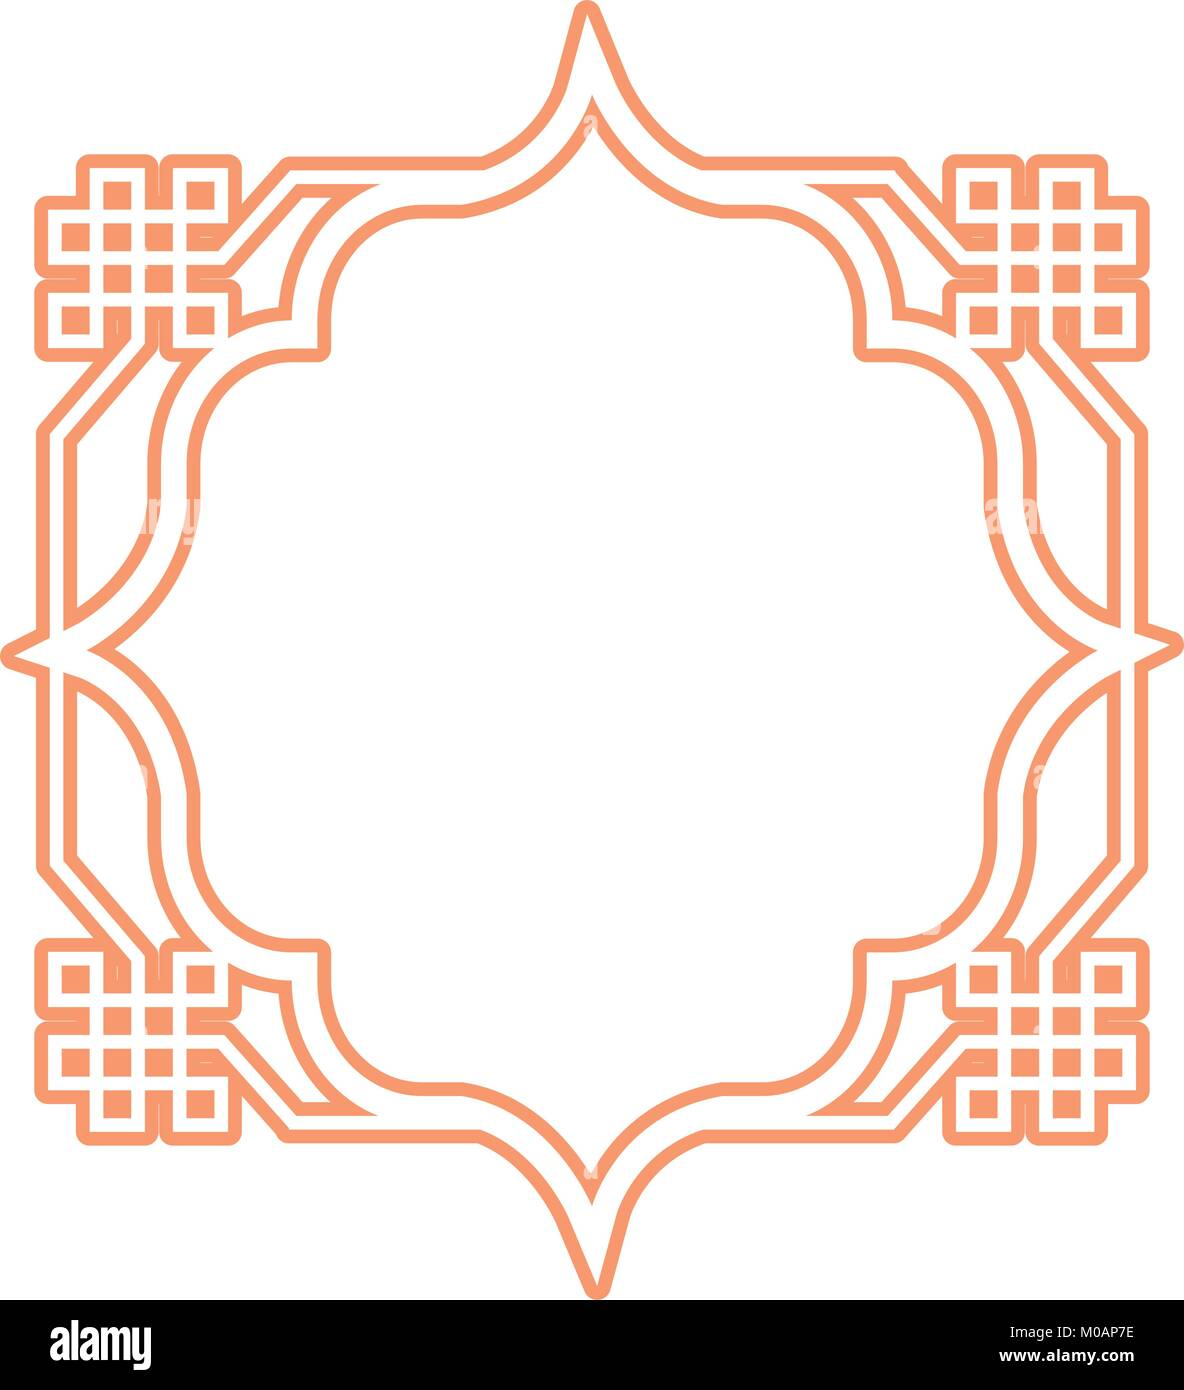 Icono de marco de estilo árabe Imagen De Stock